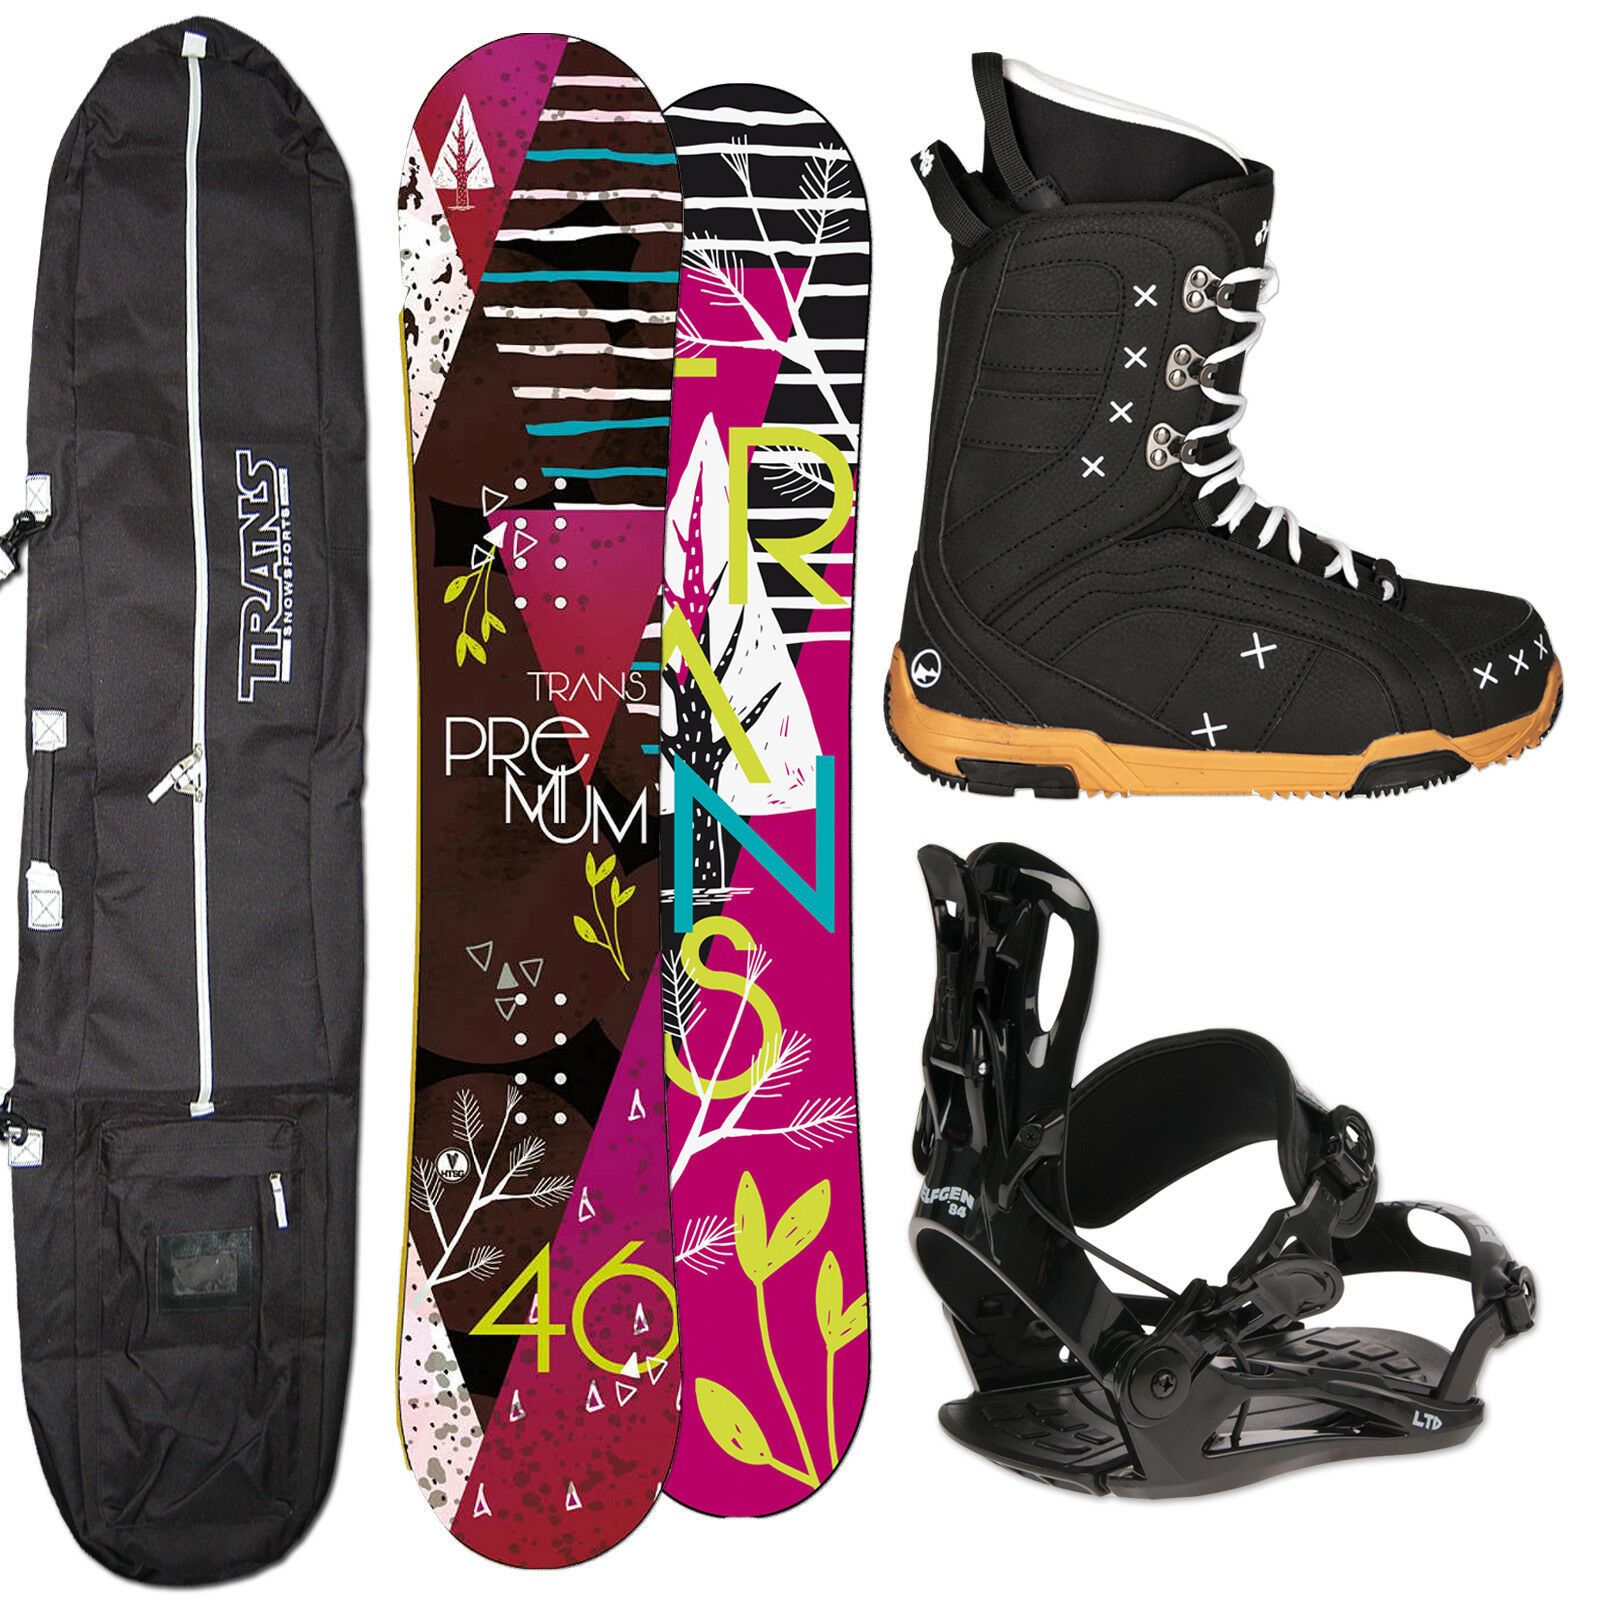 DAMEN SNOWBOARD TRANS PREMIUM 144 CM  + FASTEC BINDUNG GR. S + Stiefel + BAG